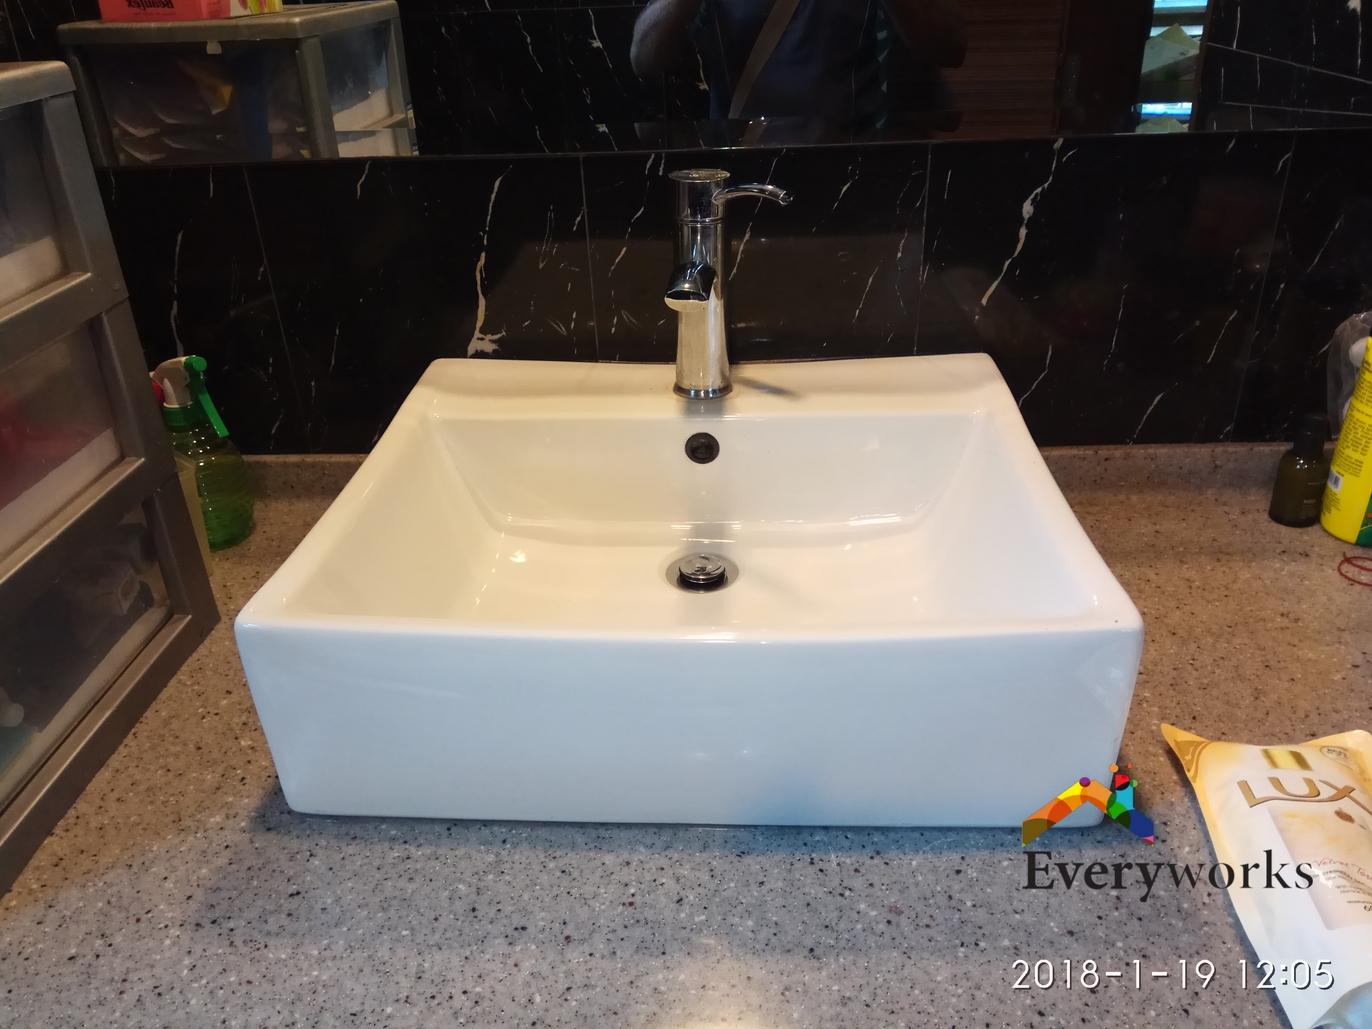 Fix Leaking Pipe below Bathroom Wash Basin Plumber ...